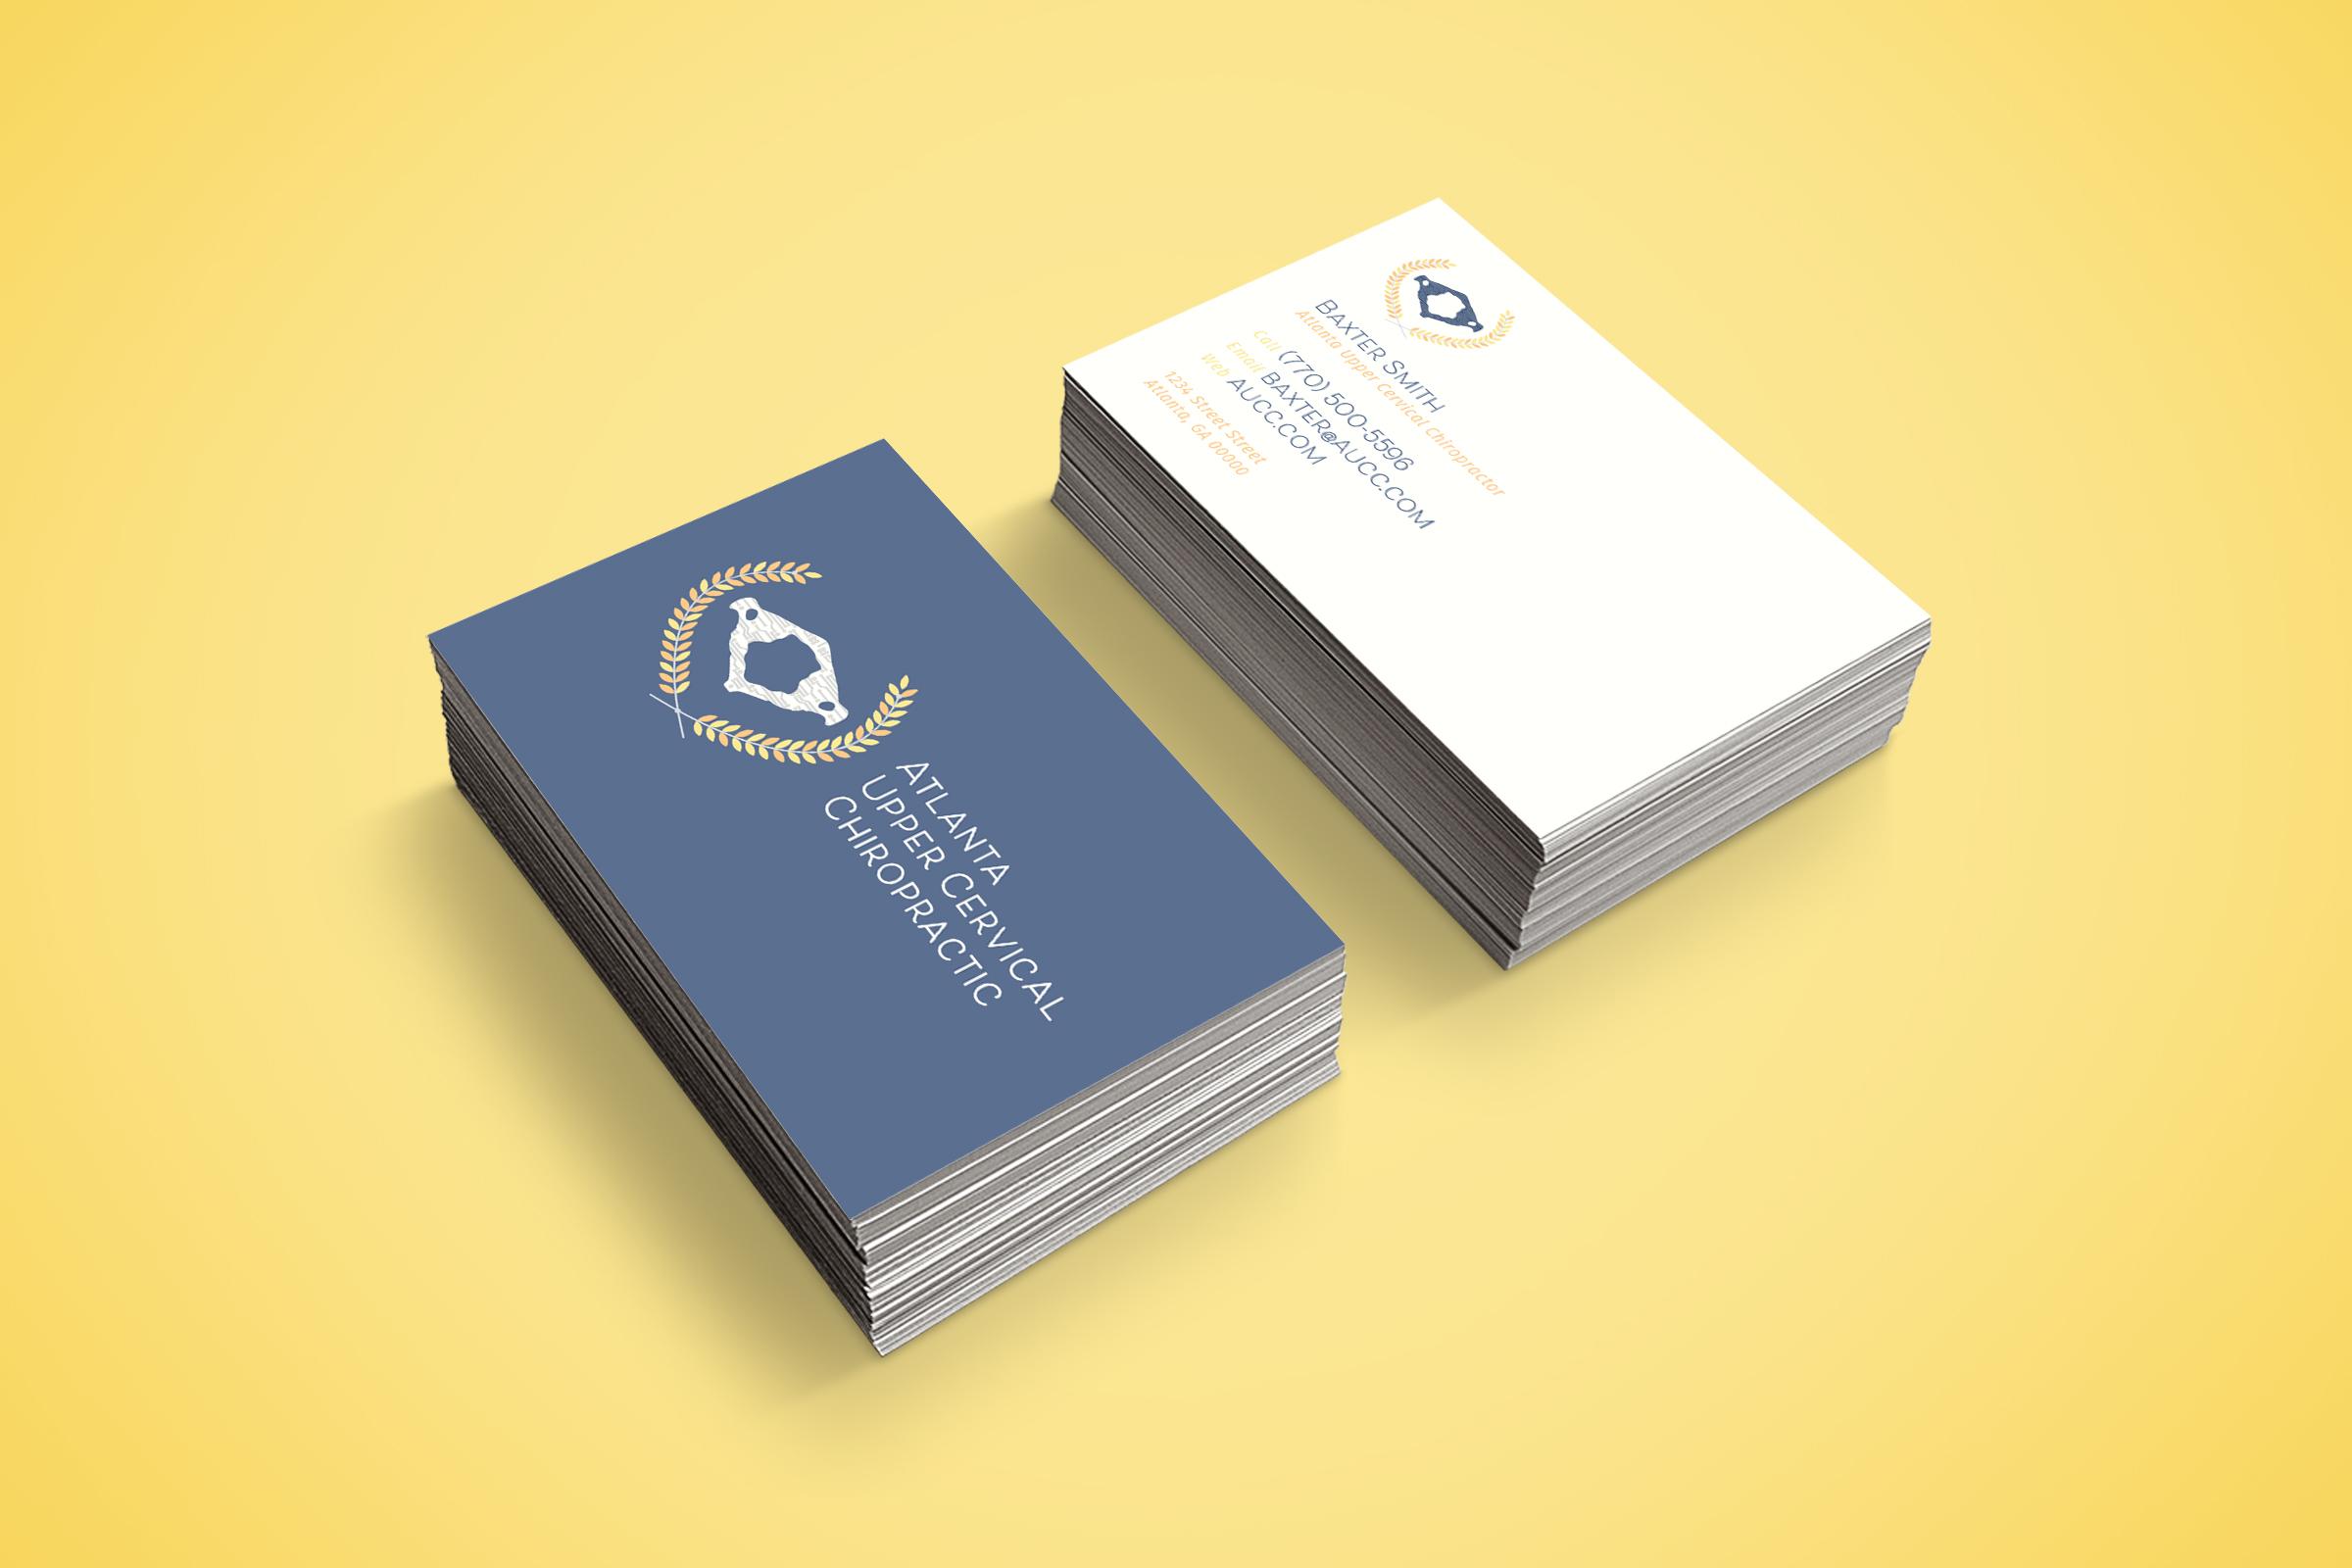 hearthfire-creative-logo-brand-identity-designer-denver-colorado-atlanta-upper-cervical-chiropractic-4.jpg